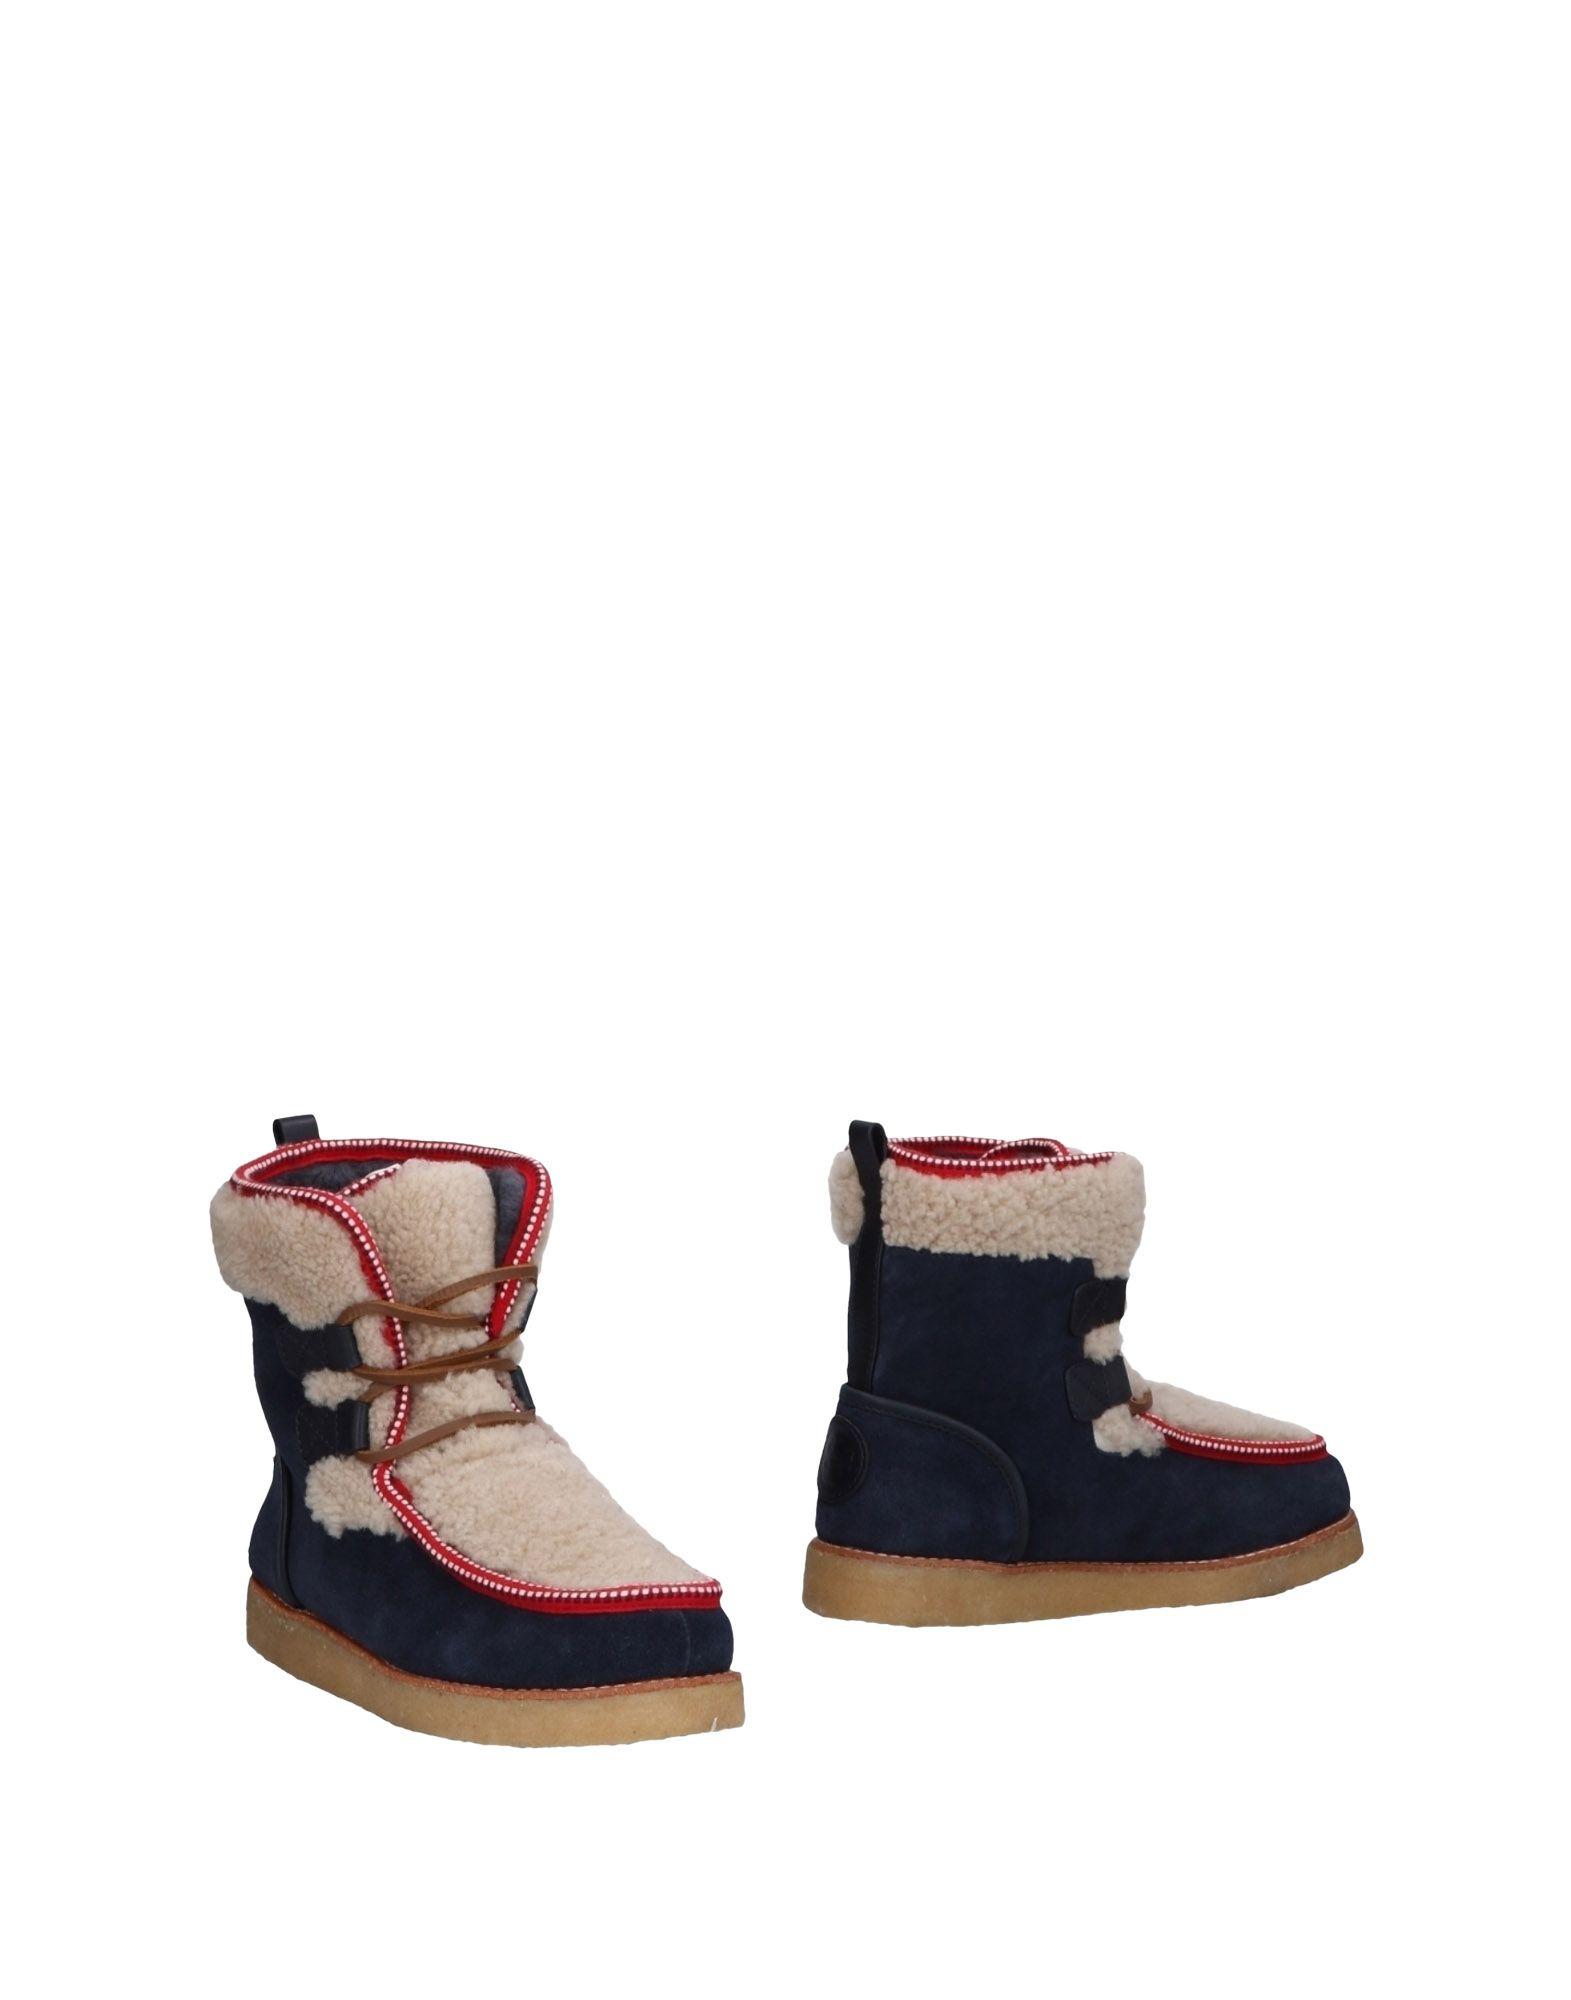 Tory 11475847RBGut Burch Stiefelette Damen  11475847RBGut Tory aussehende strapazierfähige Schuhe 7e1572